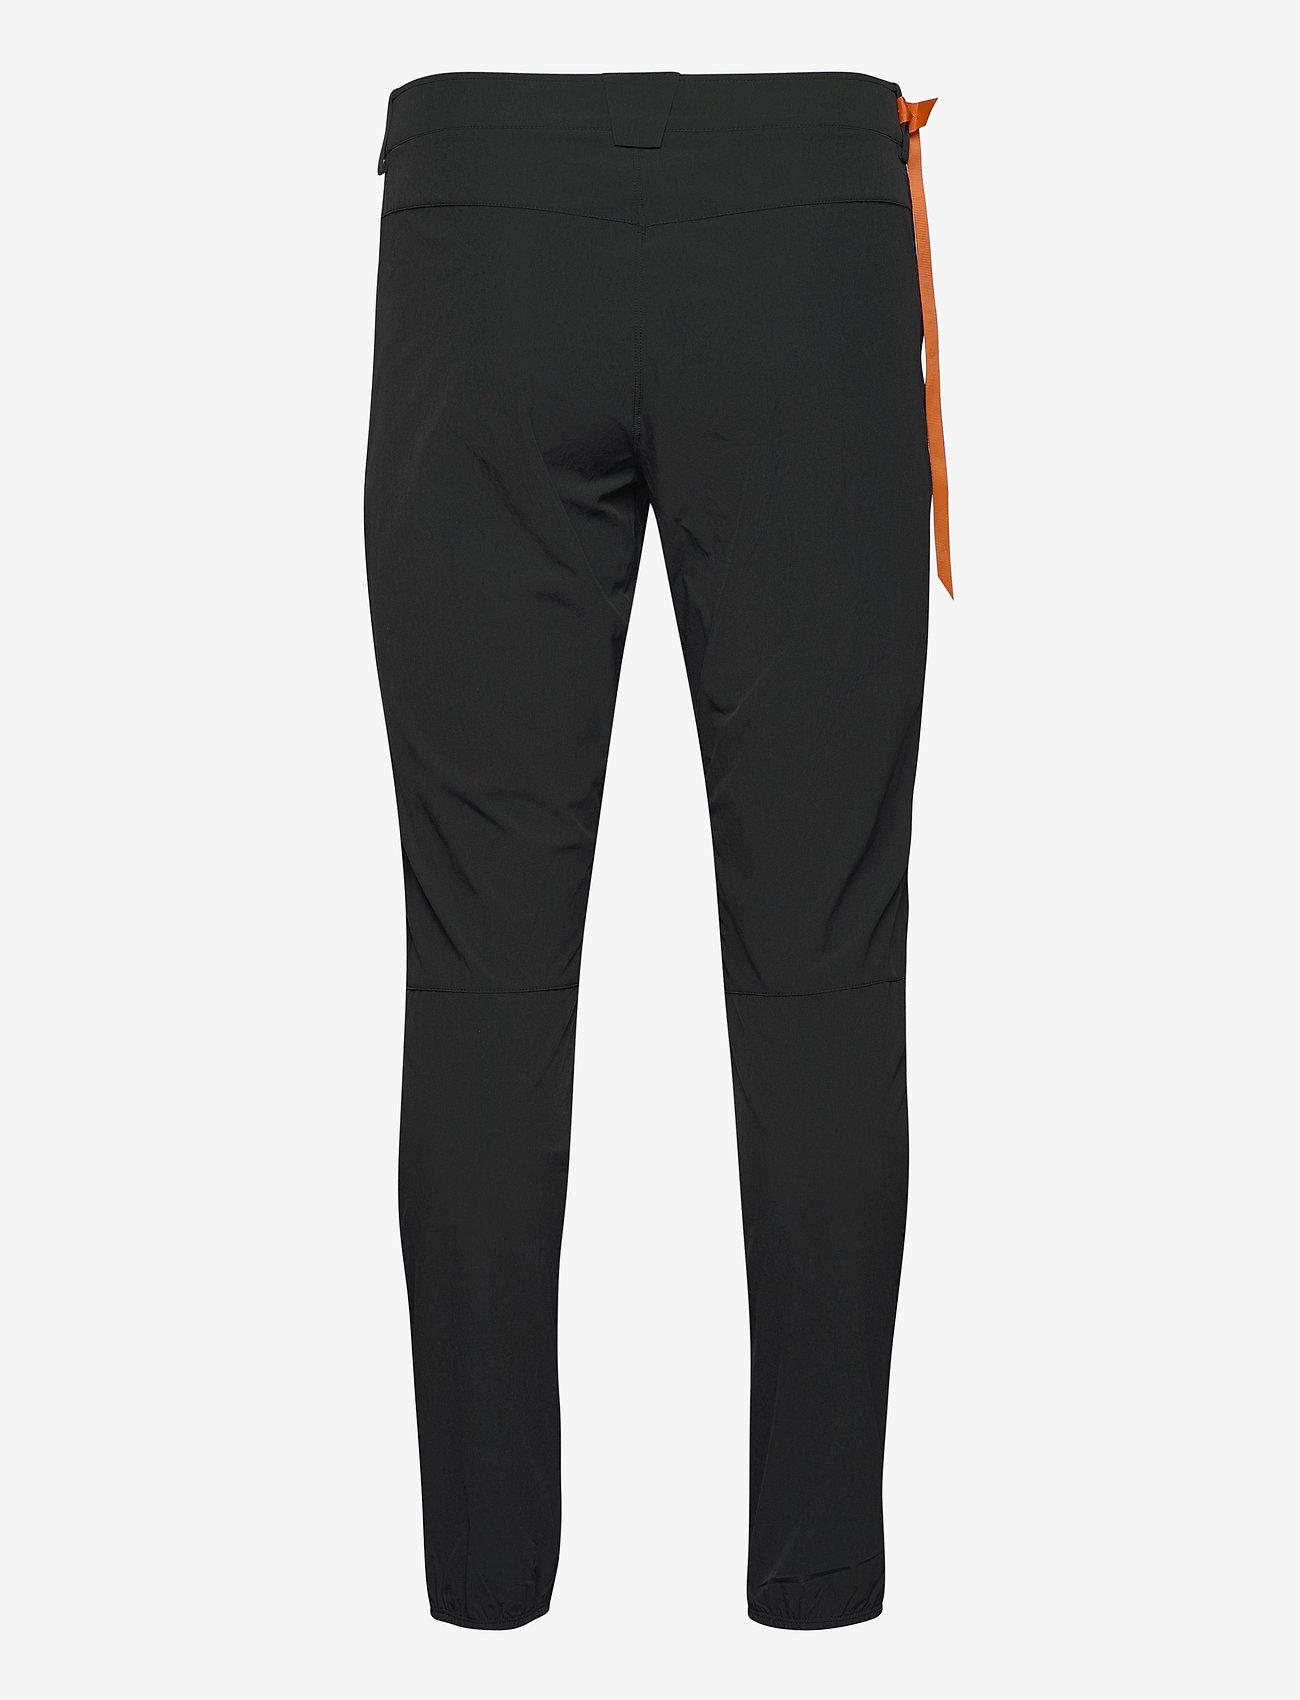 Salomon - WAYFARER TAPERED PANTS M Black - outdoorbukser - black - 1